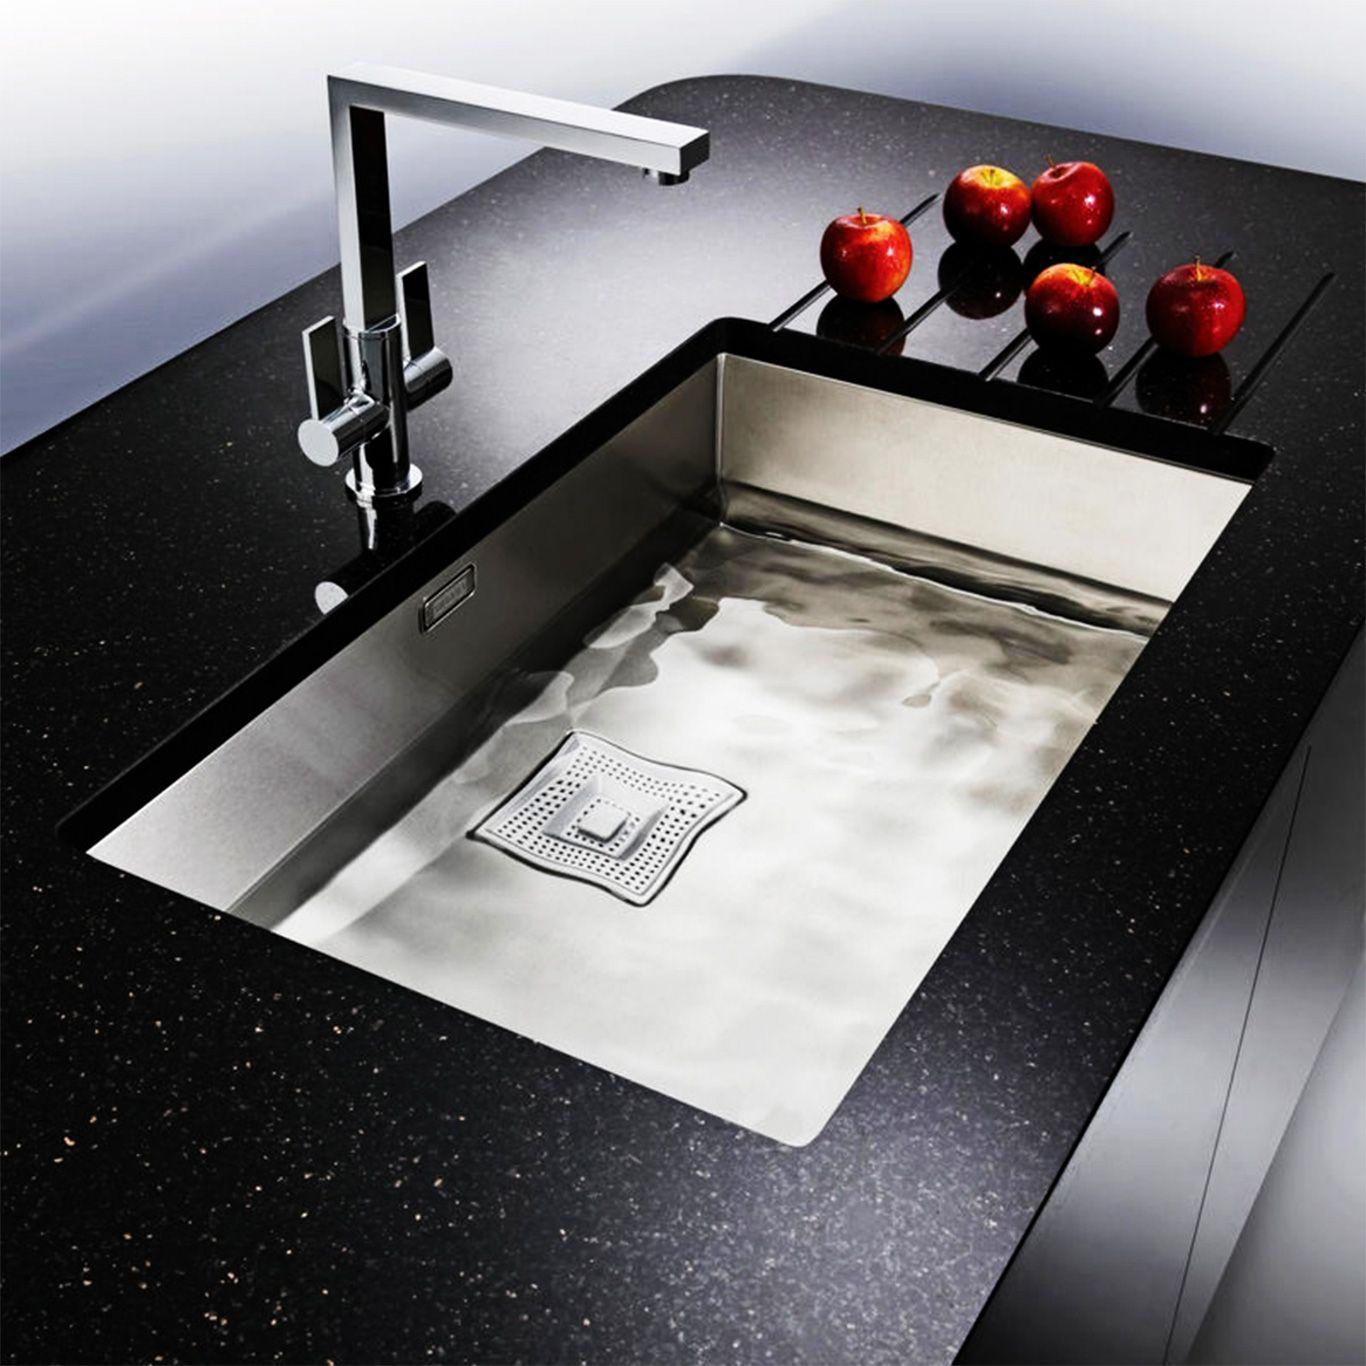 Modern Dark Countertop and Stylish Undermount Stainless Steel ...